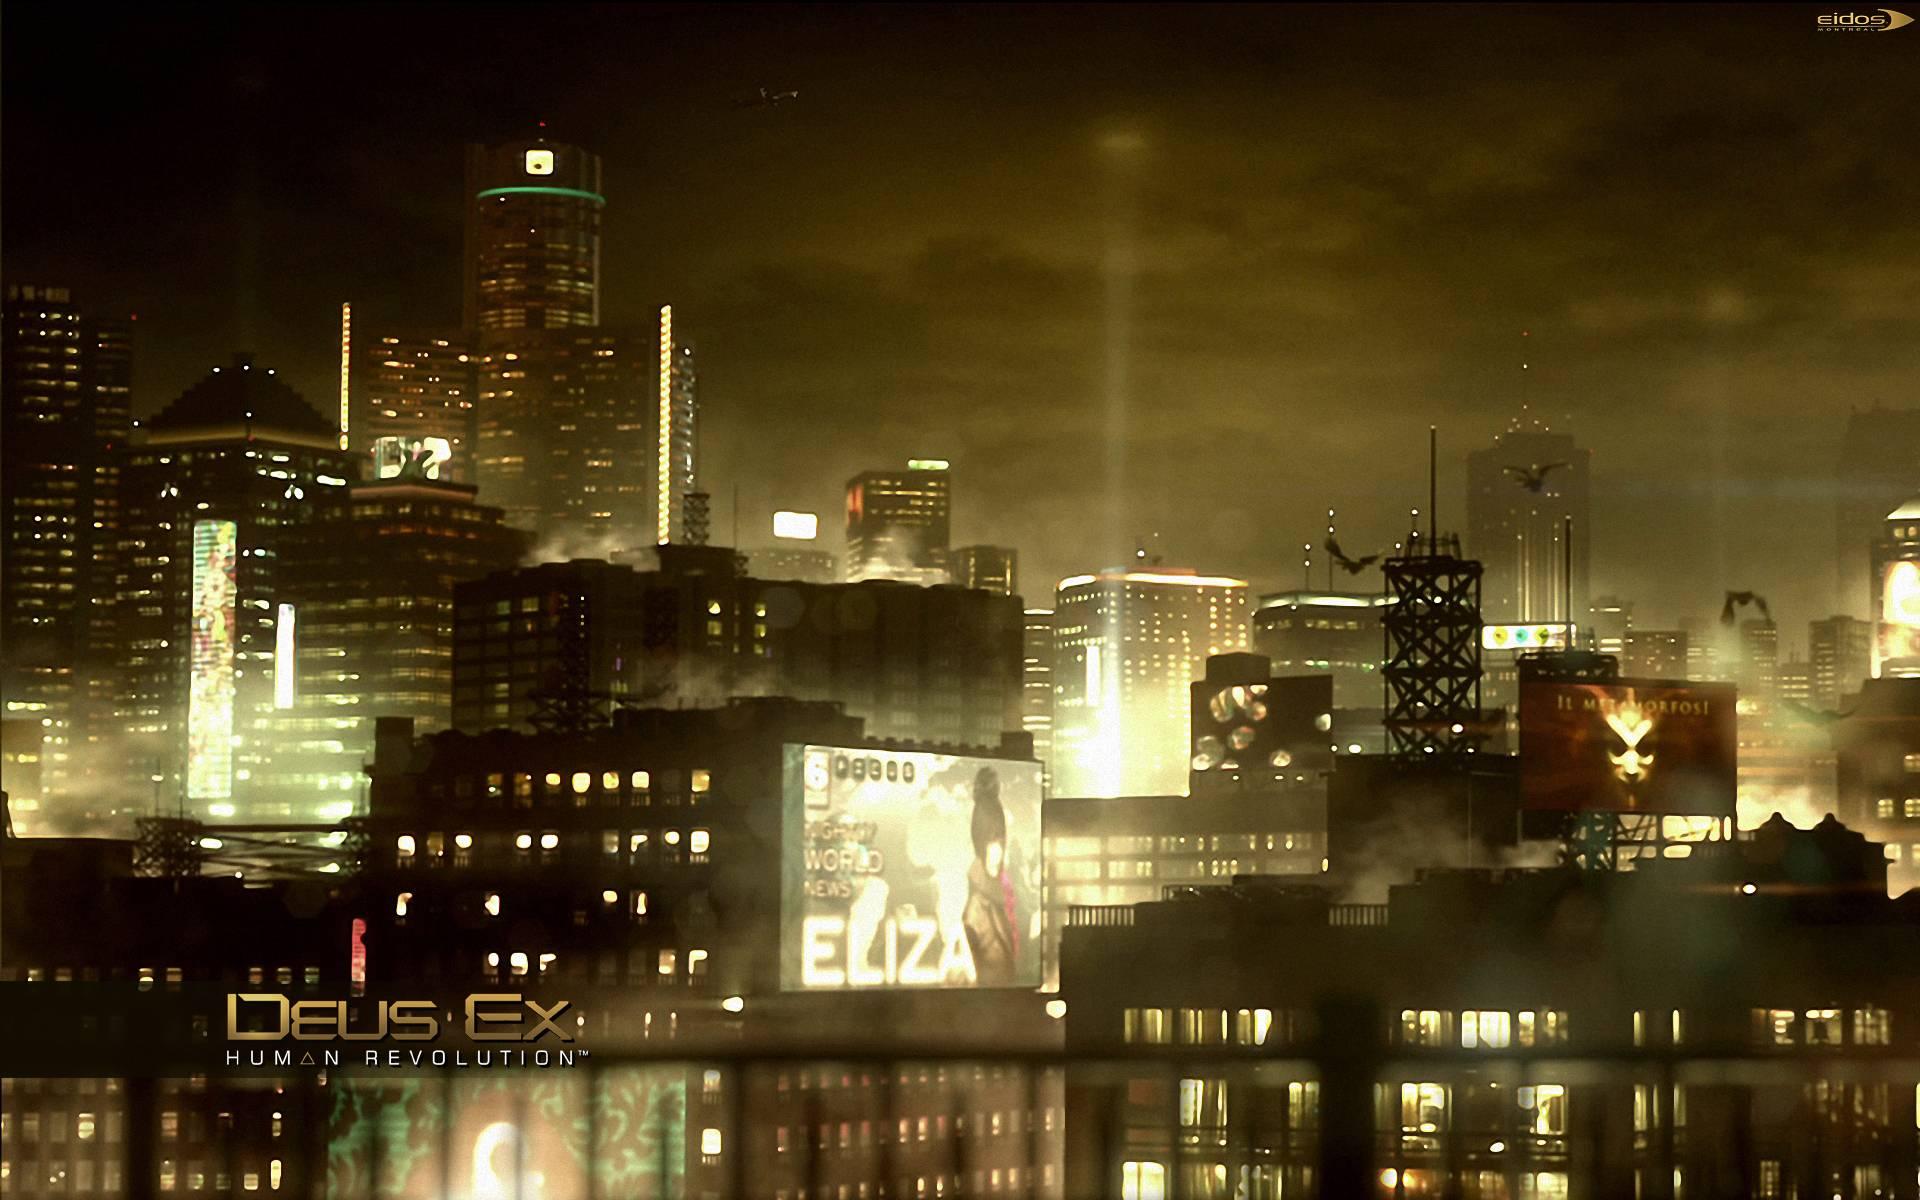 SQUARE ENIX Deus Ex Human Revolution PS3 Game